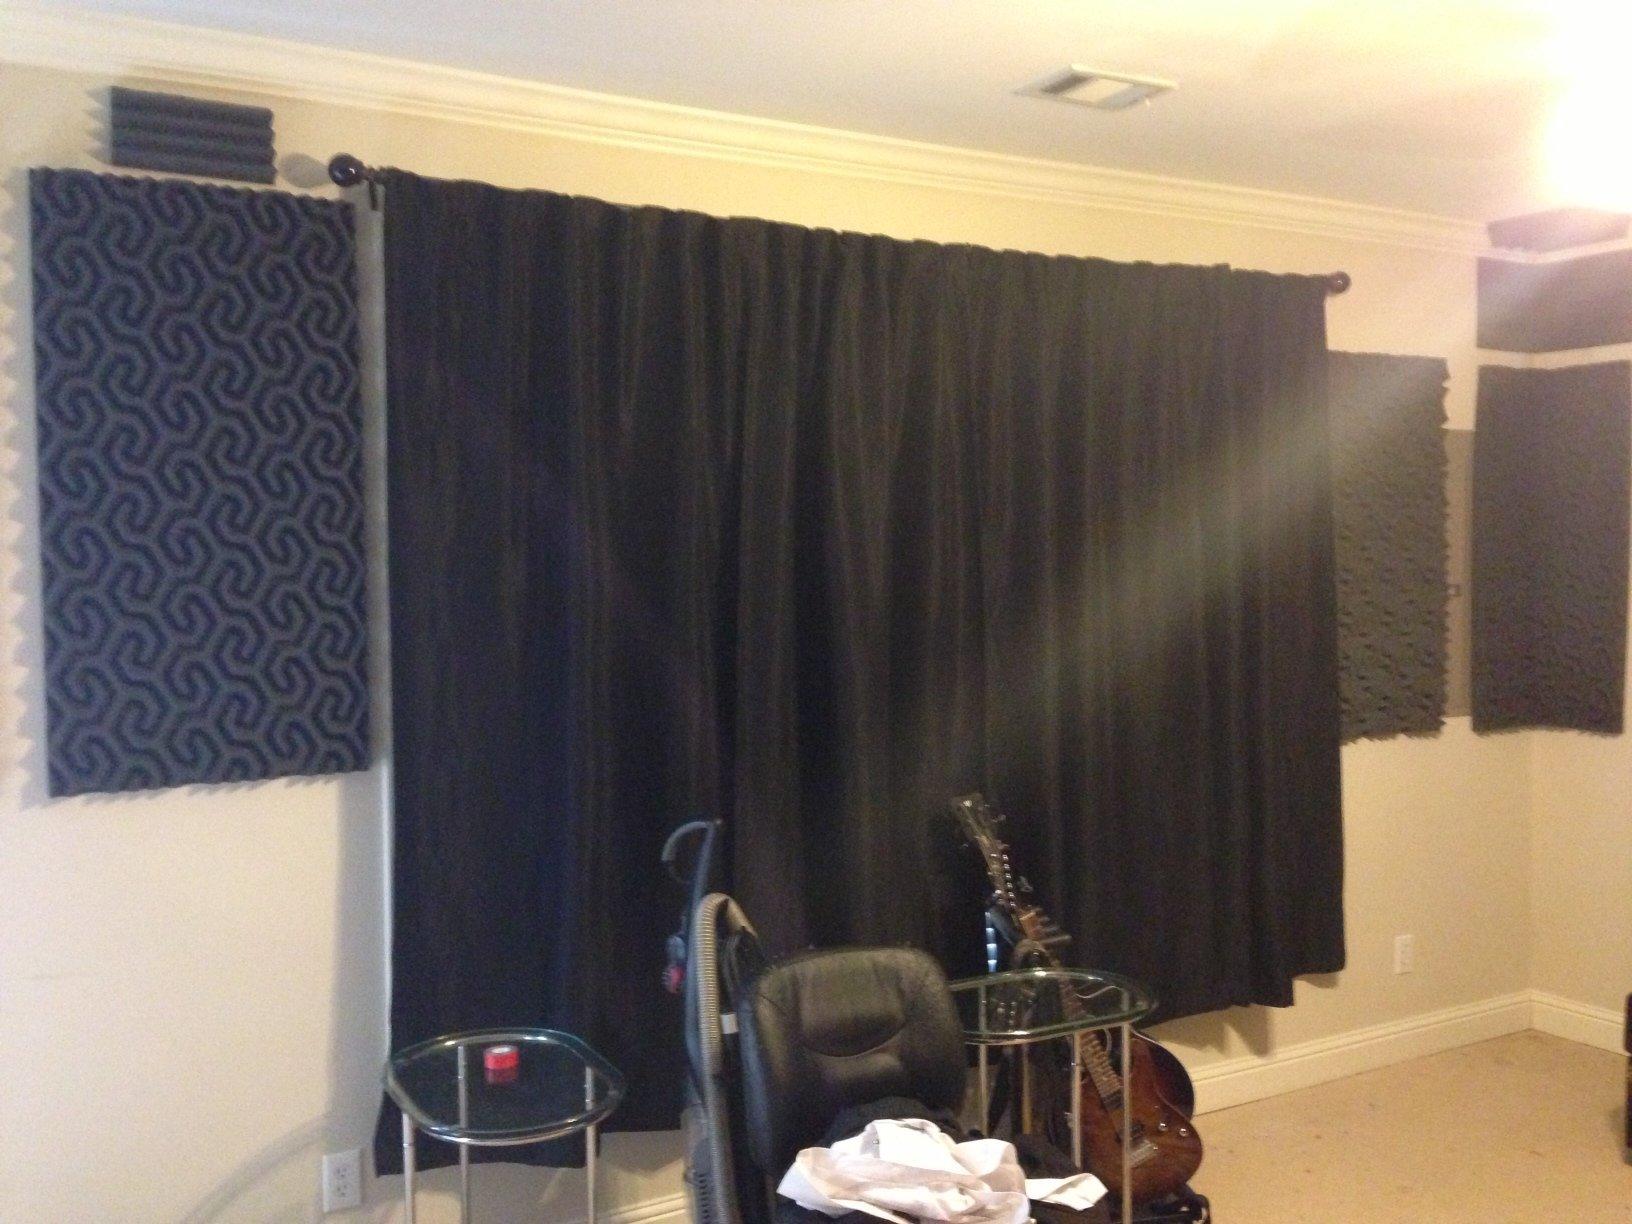 2'' SoundTraxLG PRO Studio Acoustic Foam 48 sf - Charcoal